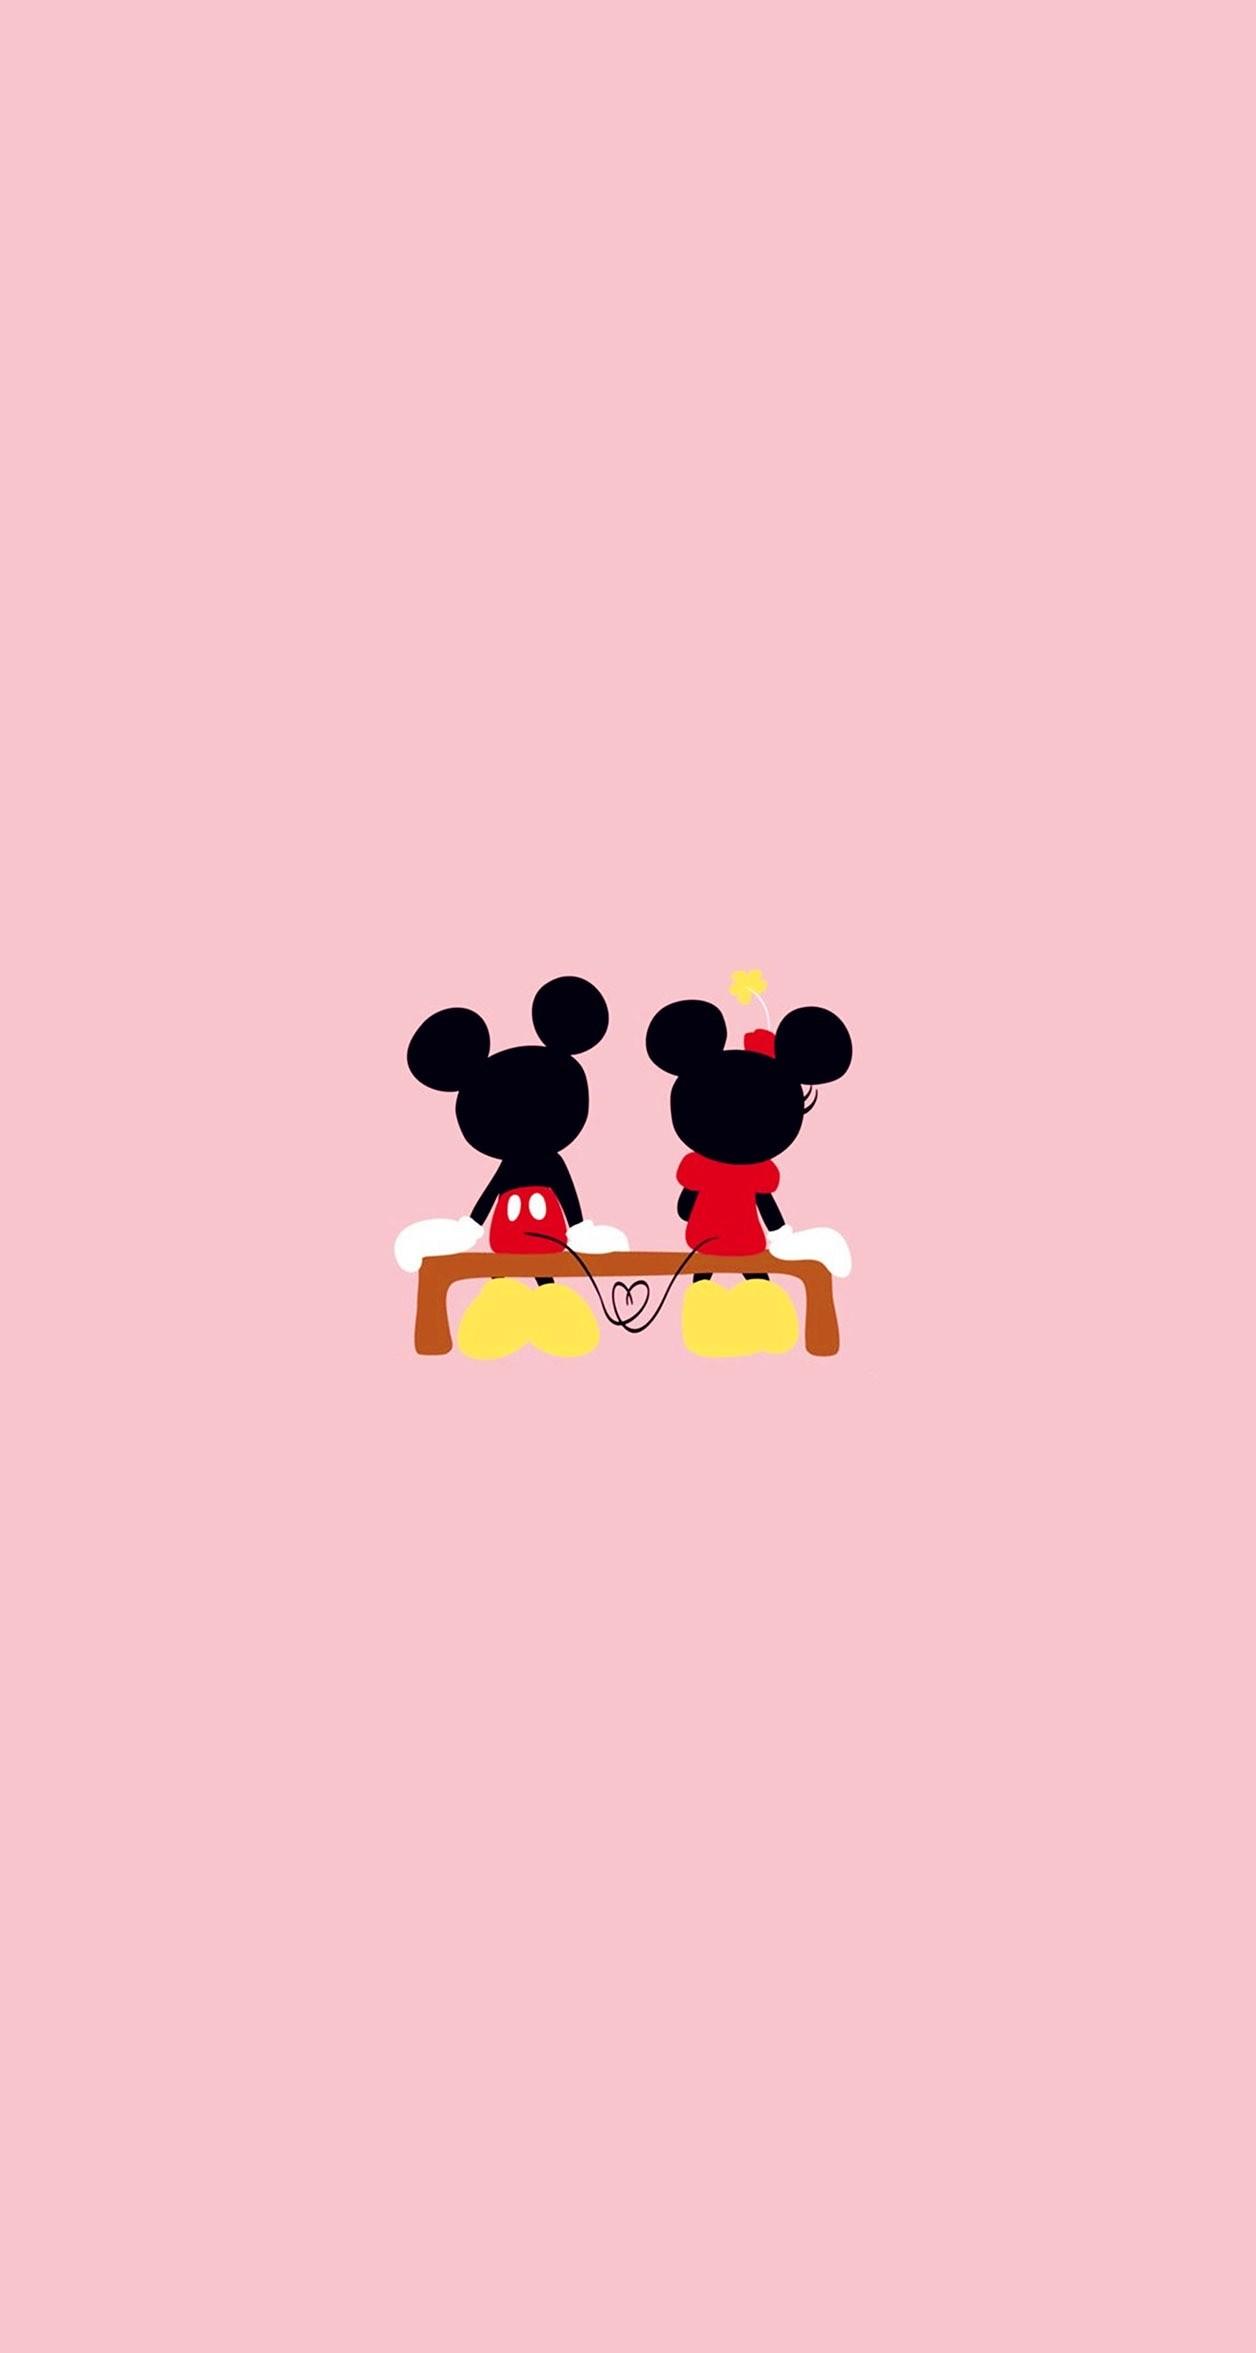 Disney Valentines Wallpaper Backgrounds 55 Images